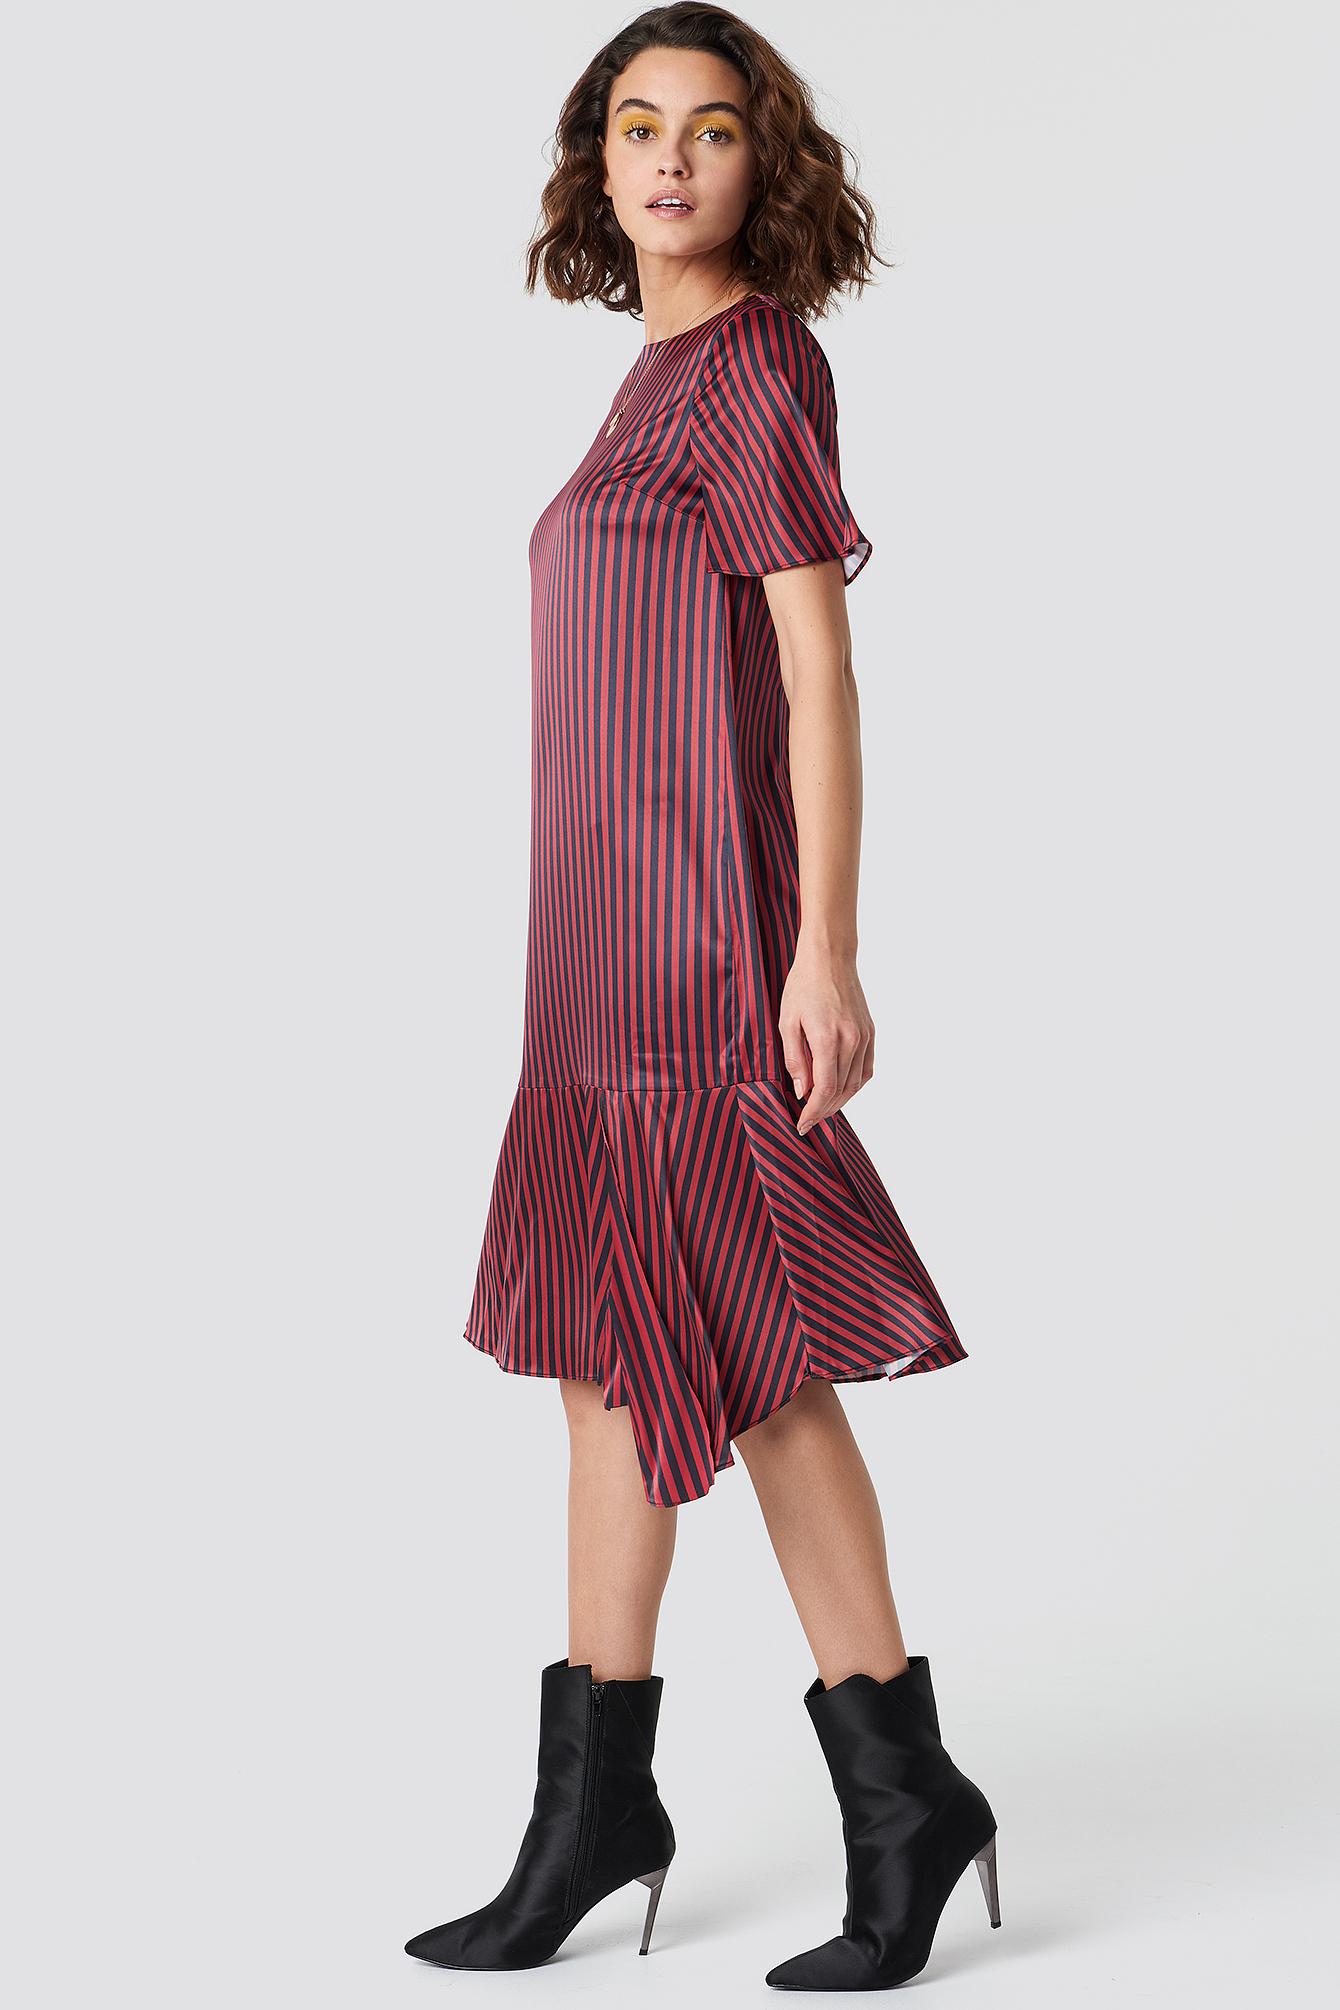 emilie briting x na-kd -  Pinstripe Satin Dress - Red